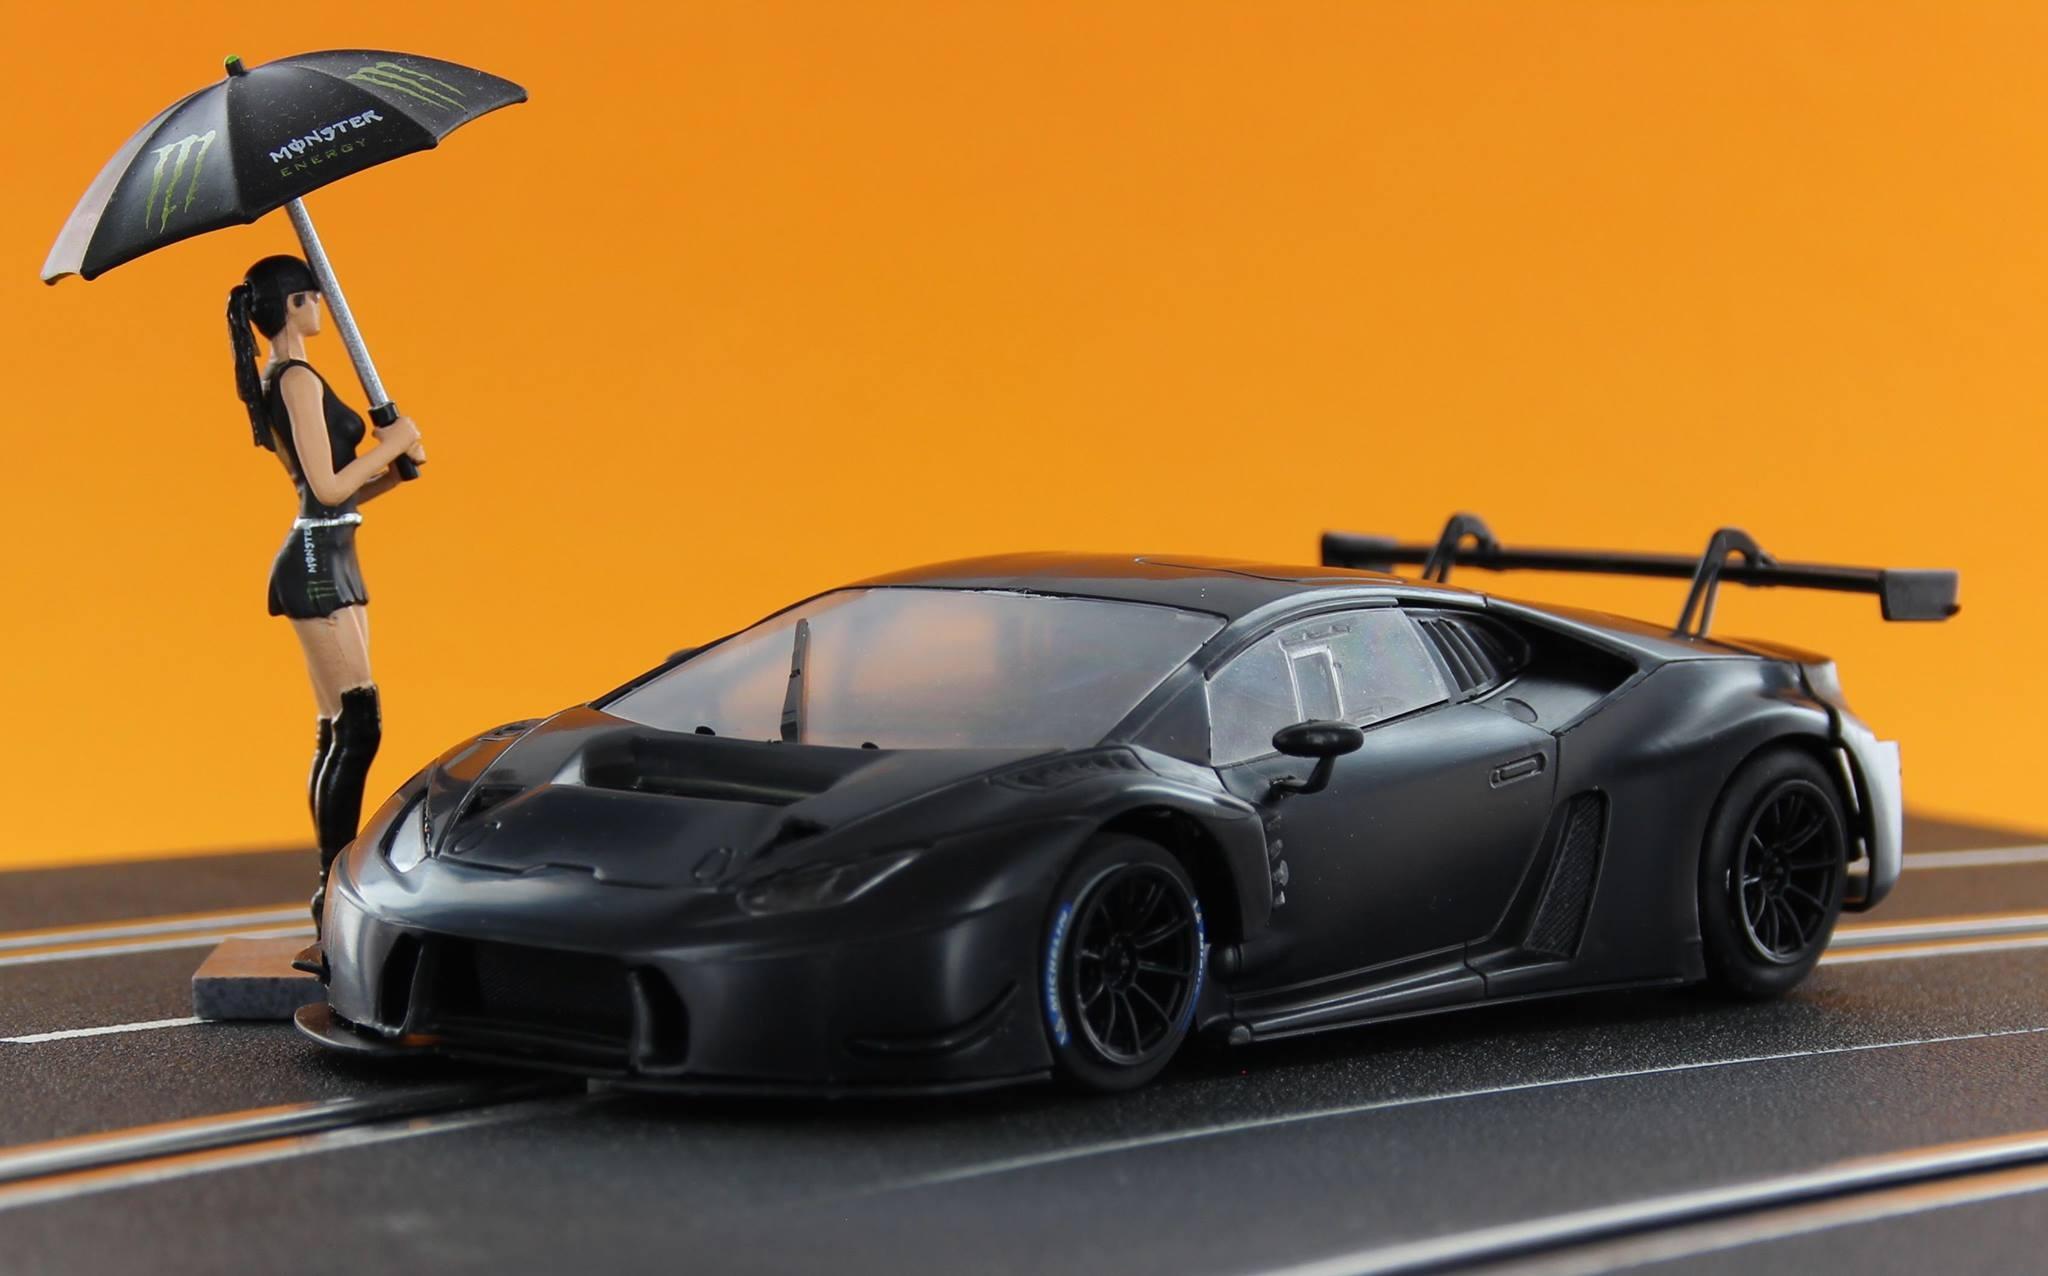 Sideways: La Lamborghini GT3 Huracan